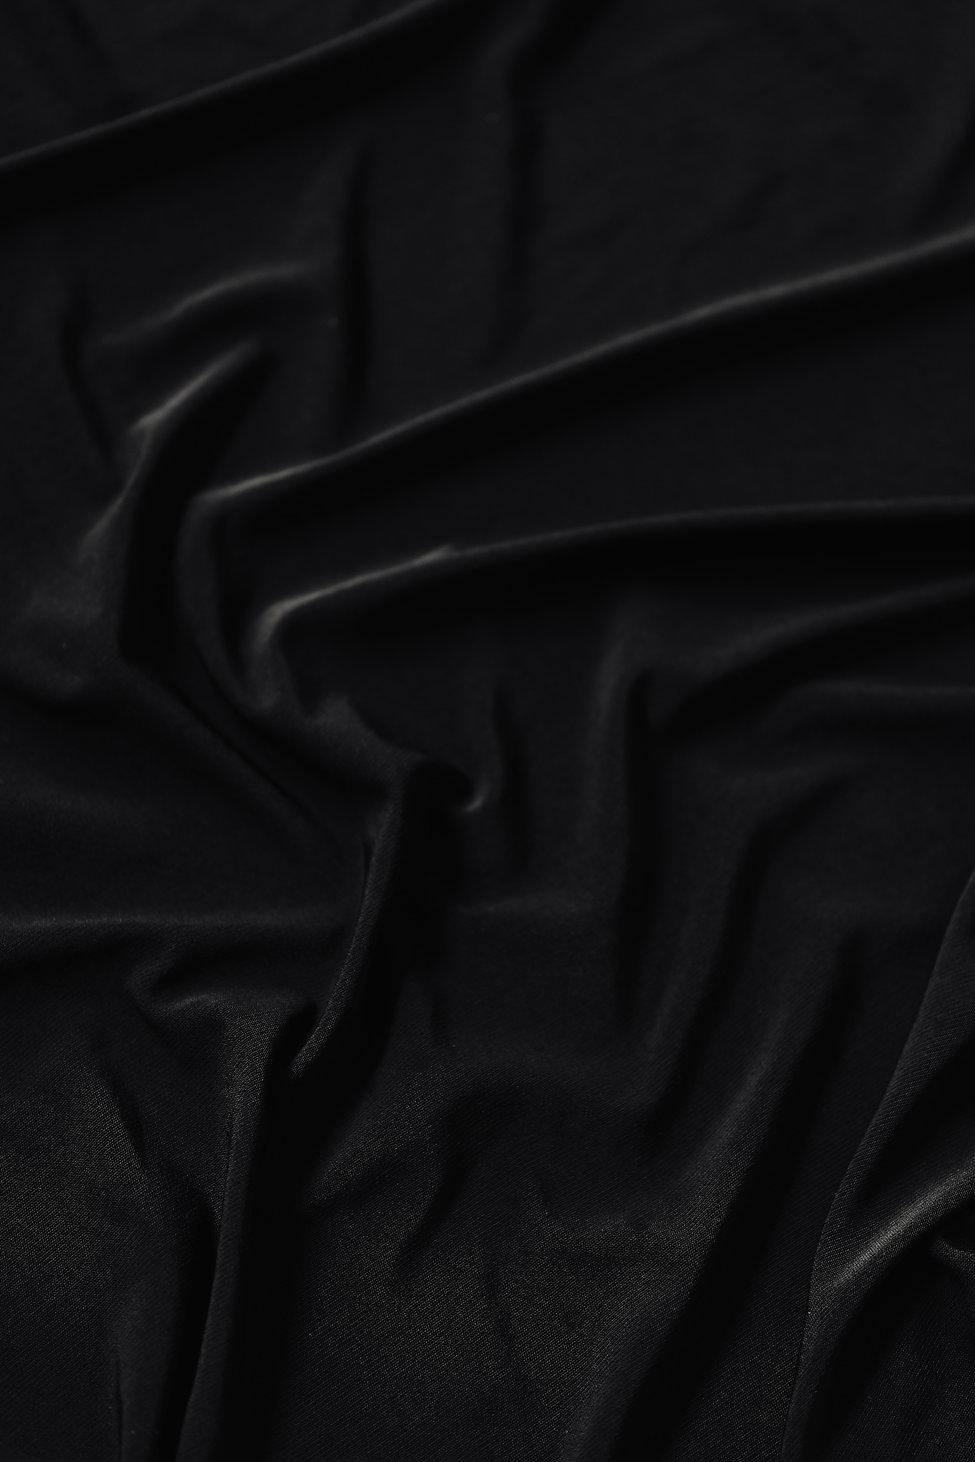 pexels-karolina-grabowska-4814069.jpg